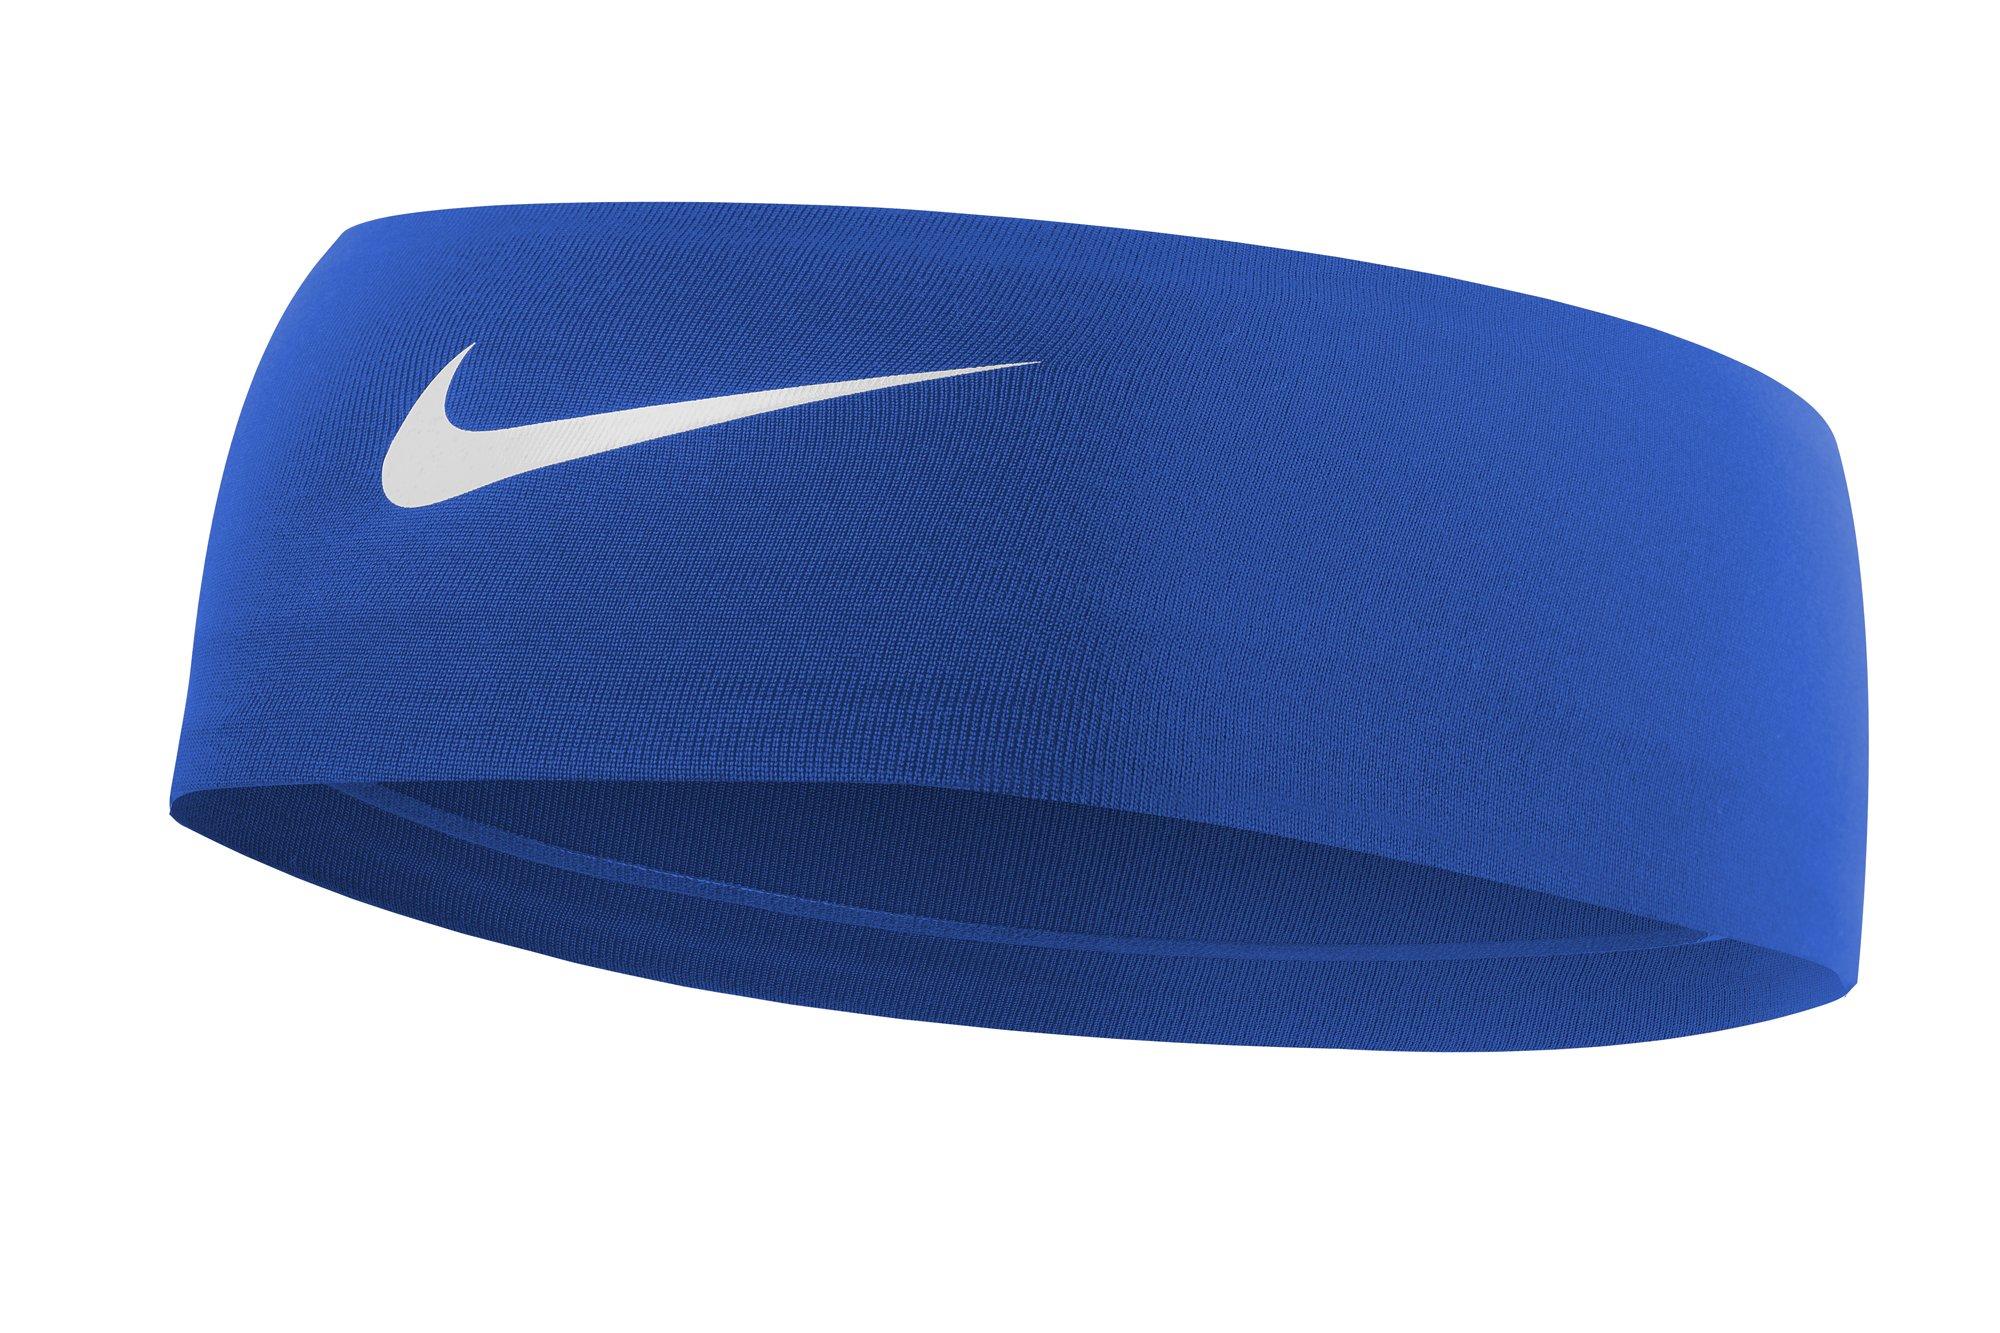 Nike Women's Fury Headband 2.0 (Game Royal/White) by Nike (Image #1)